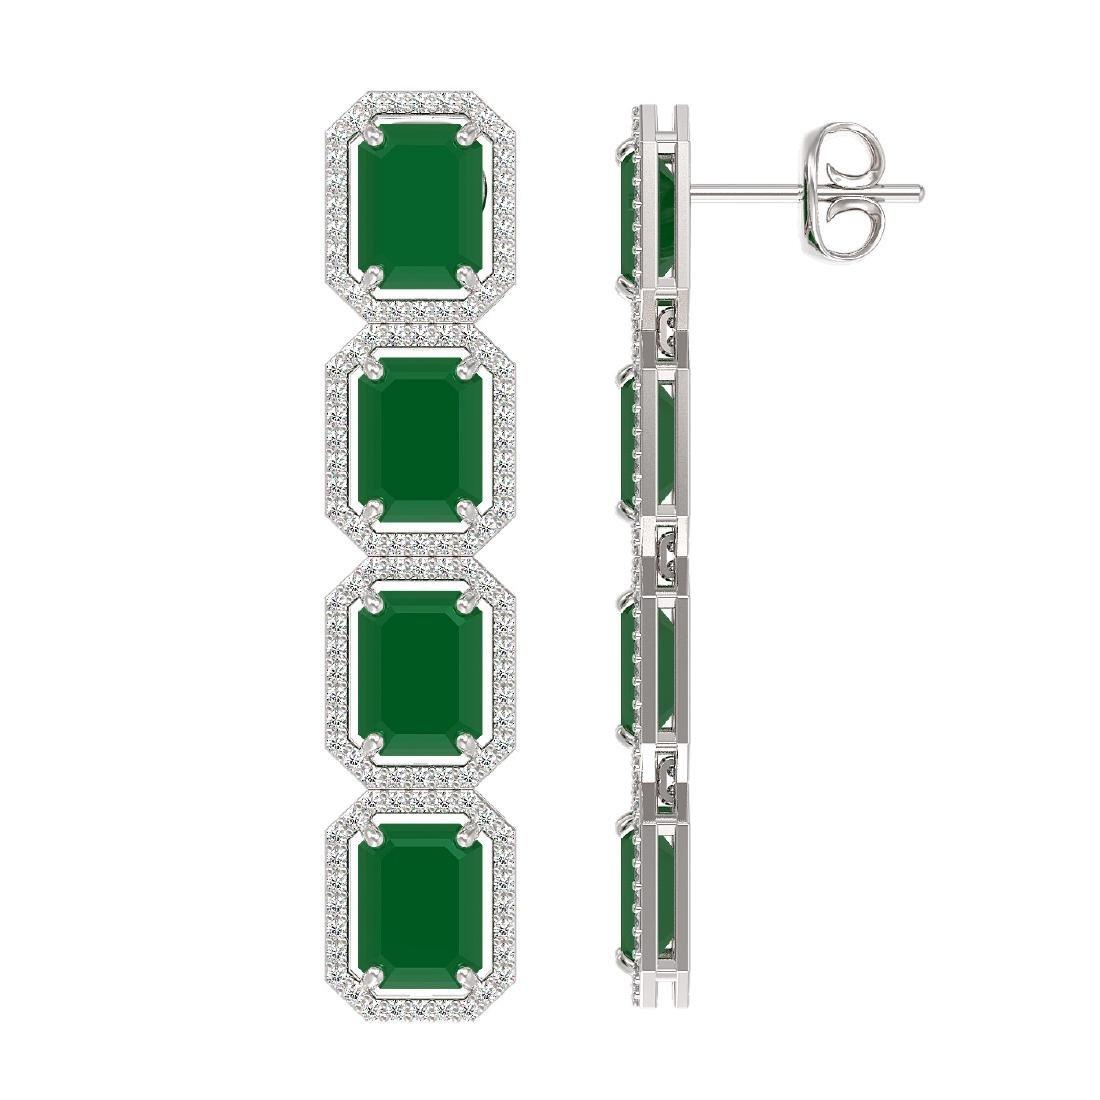 20.59 CTW Emerald & Diamond Halo Earrings 10K White - 2